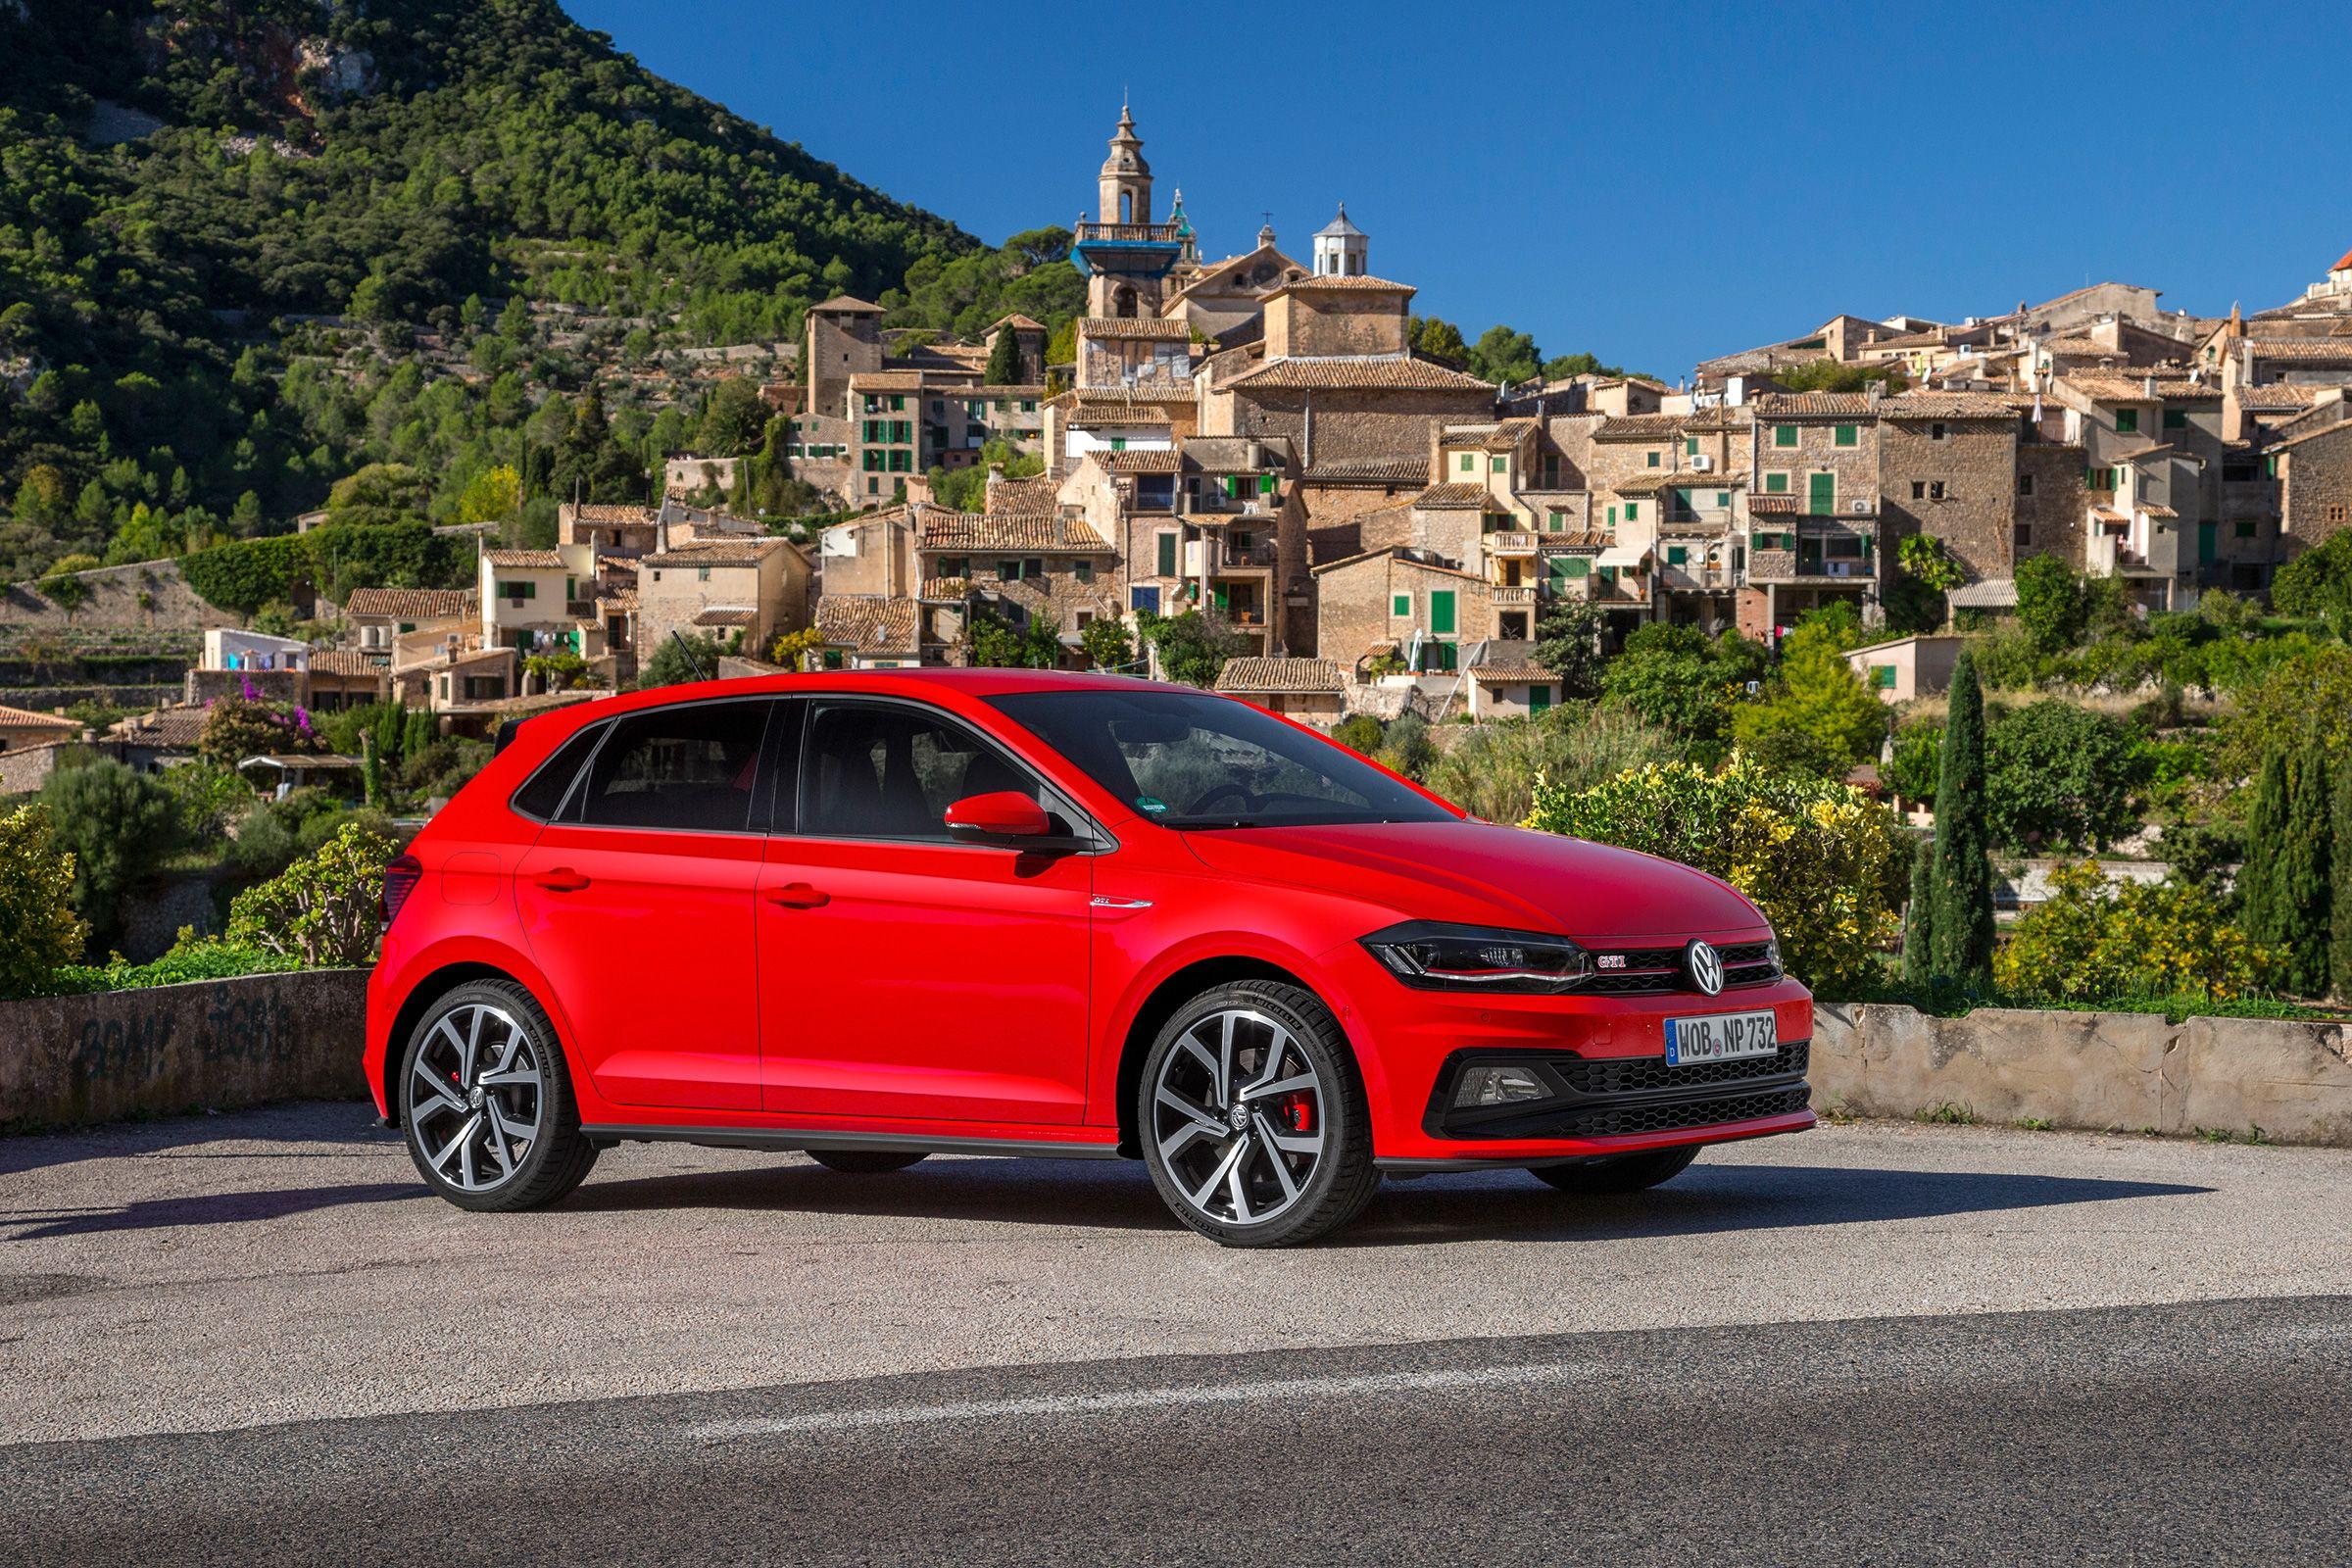 2018 Volkswagen Polo GTI Volkswagen polo, Volkswagen